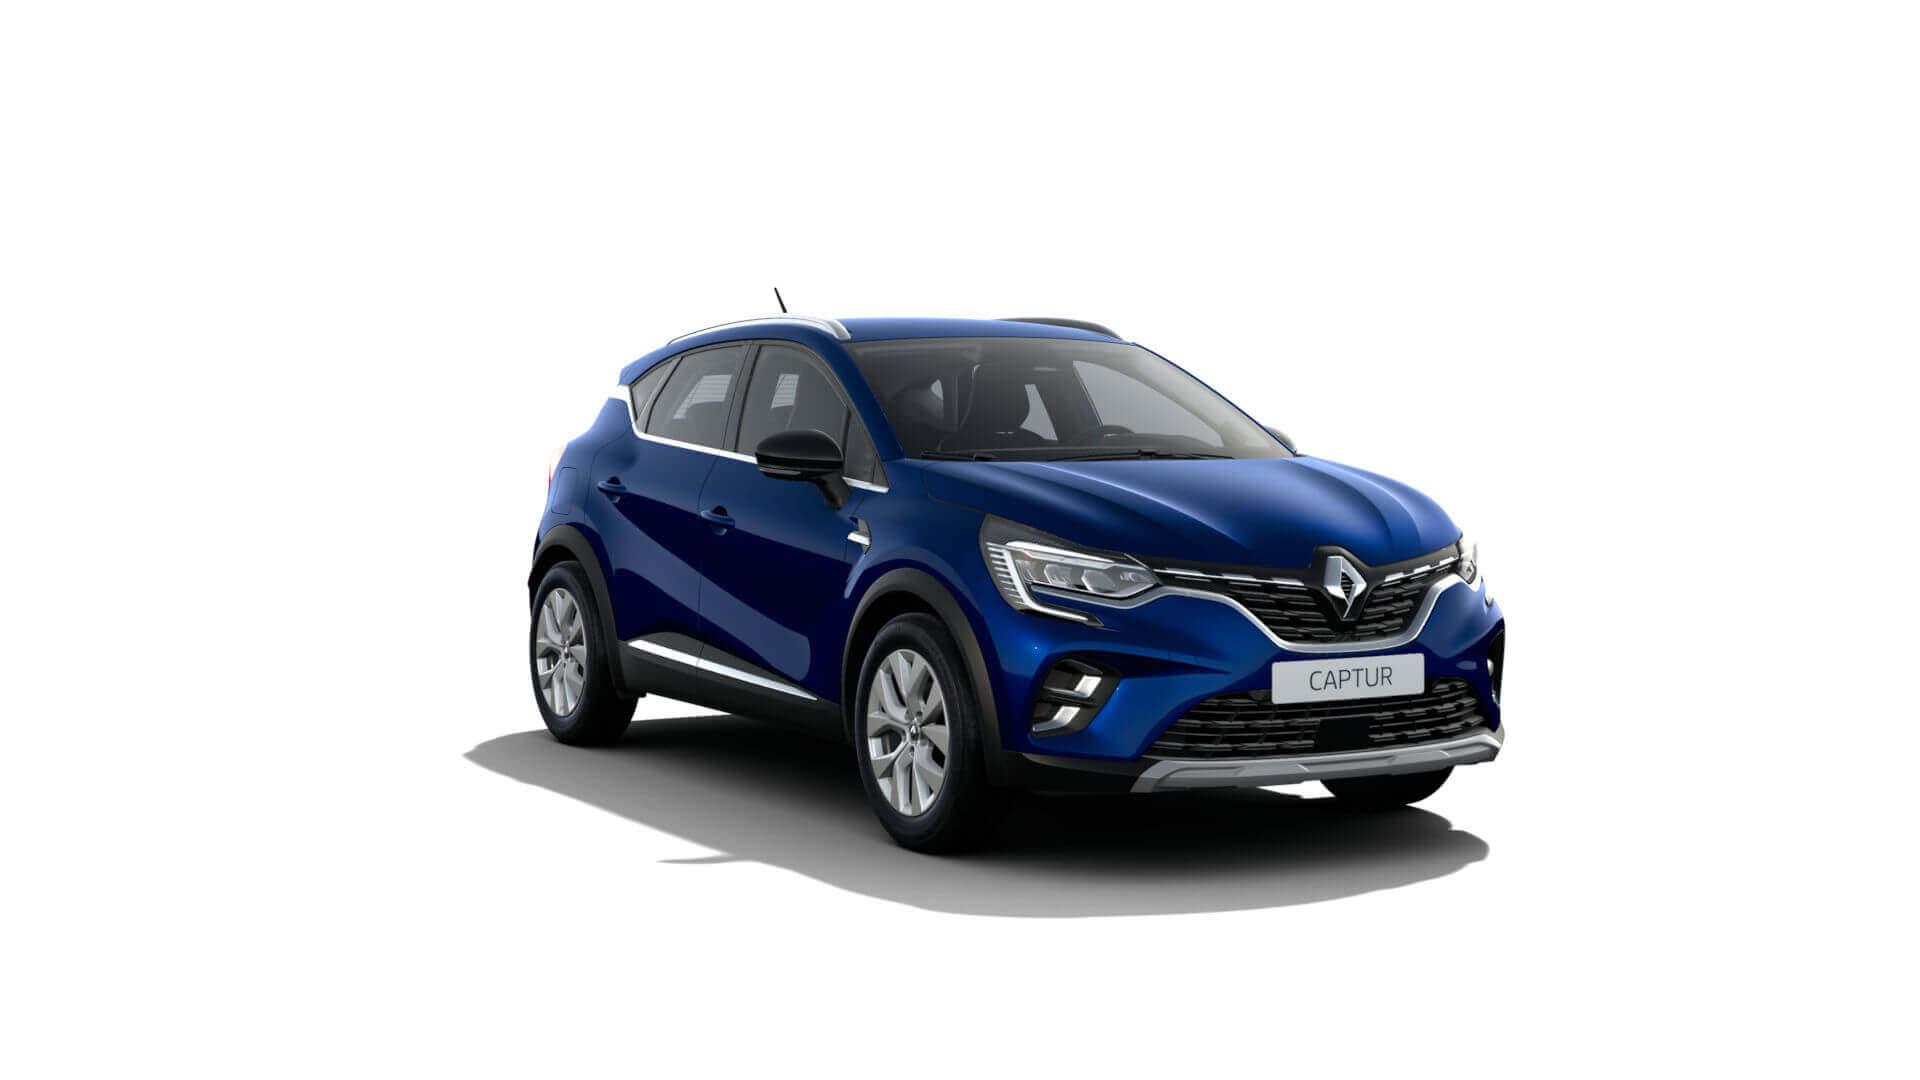 Automodell blau - Renault Captur - Renault Ahrens Hannover